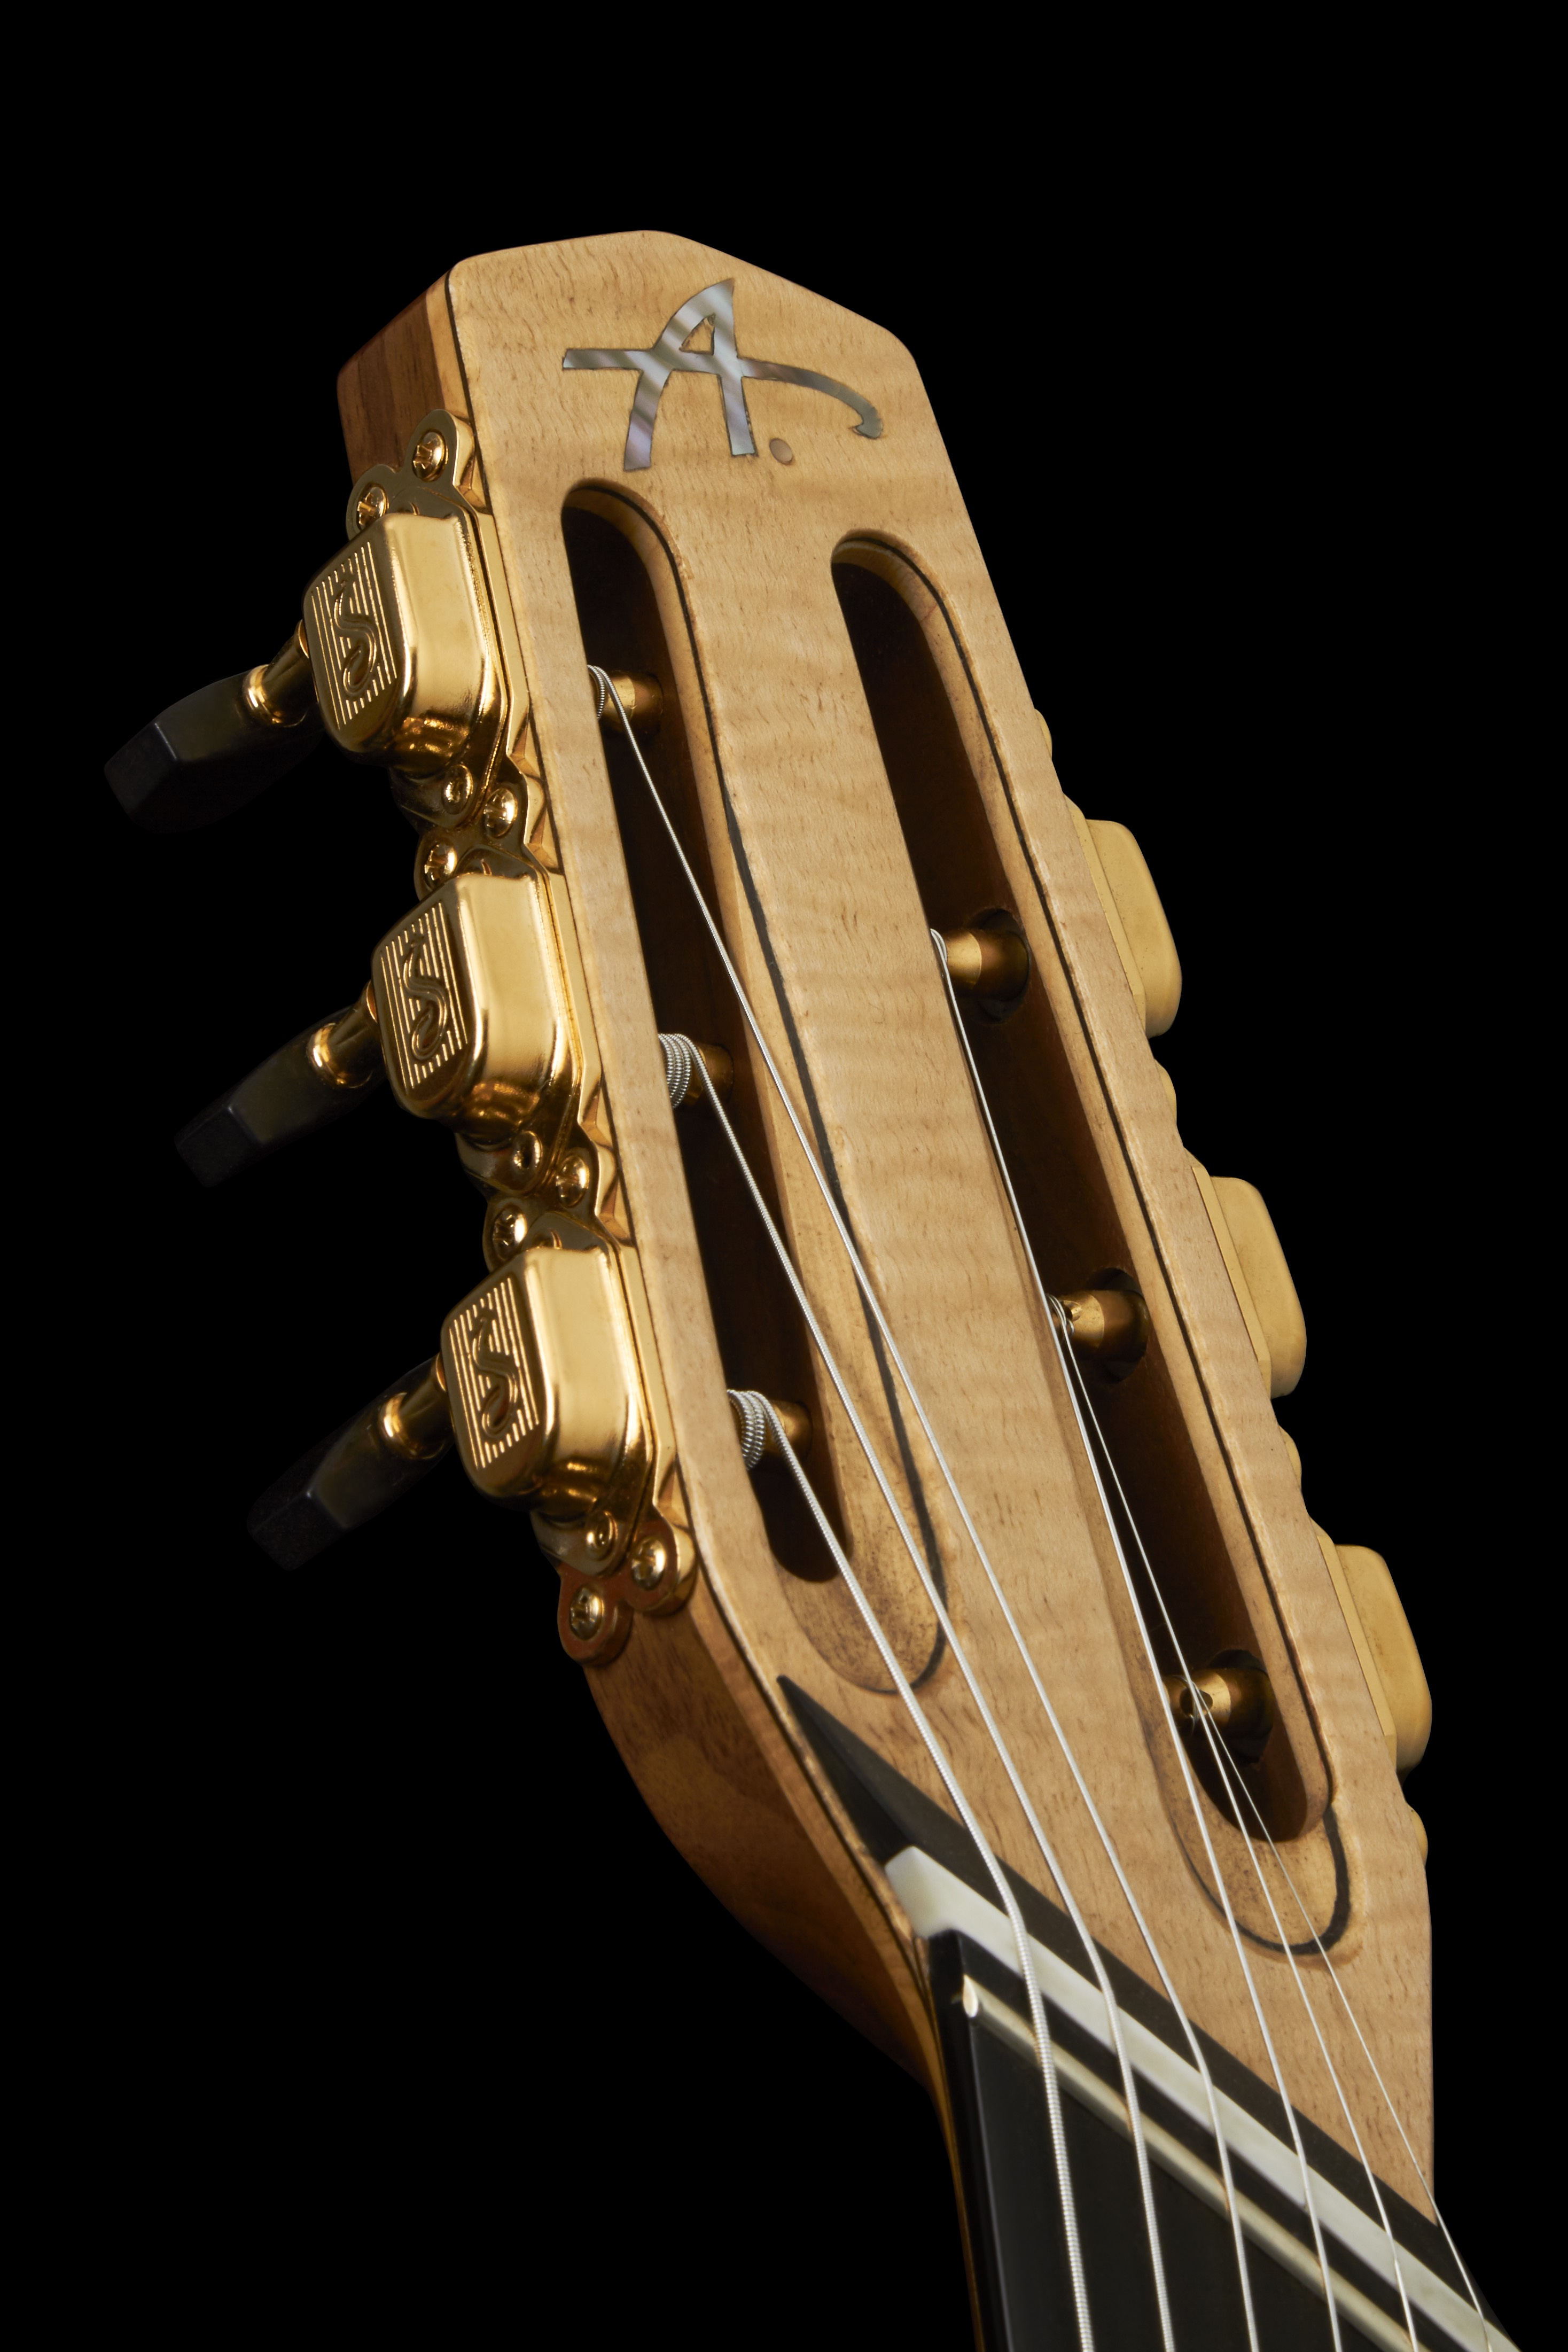 'Fannned Fret' guitar